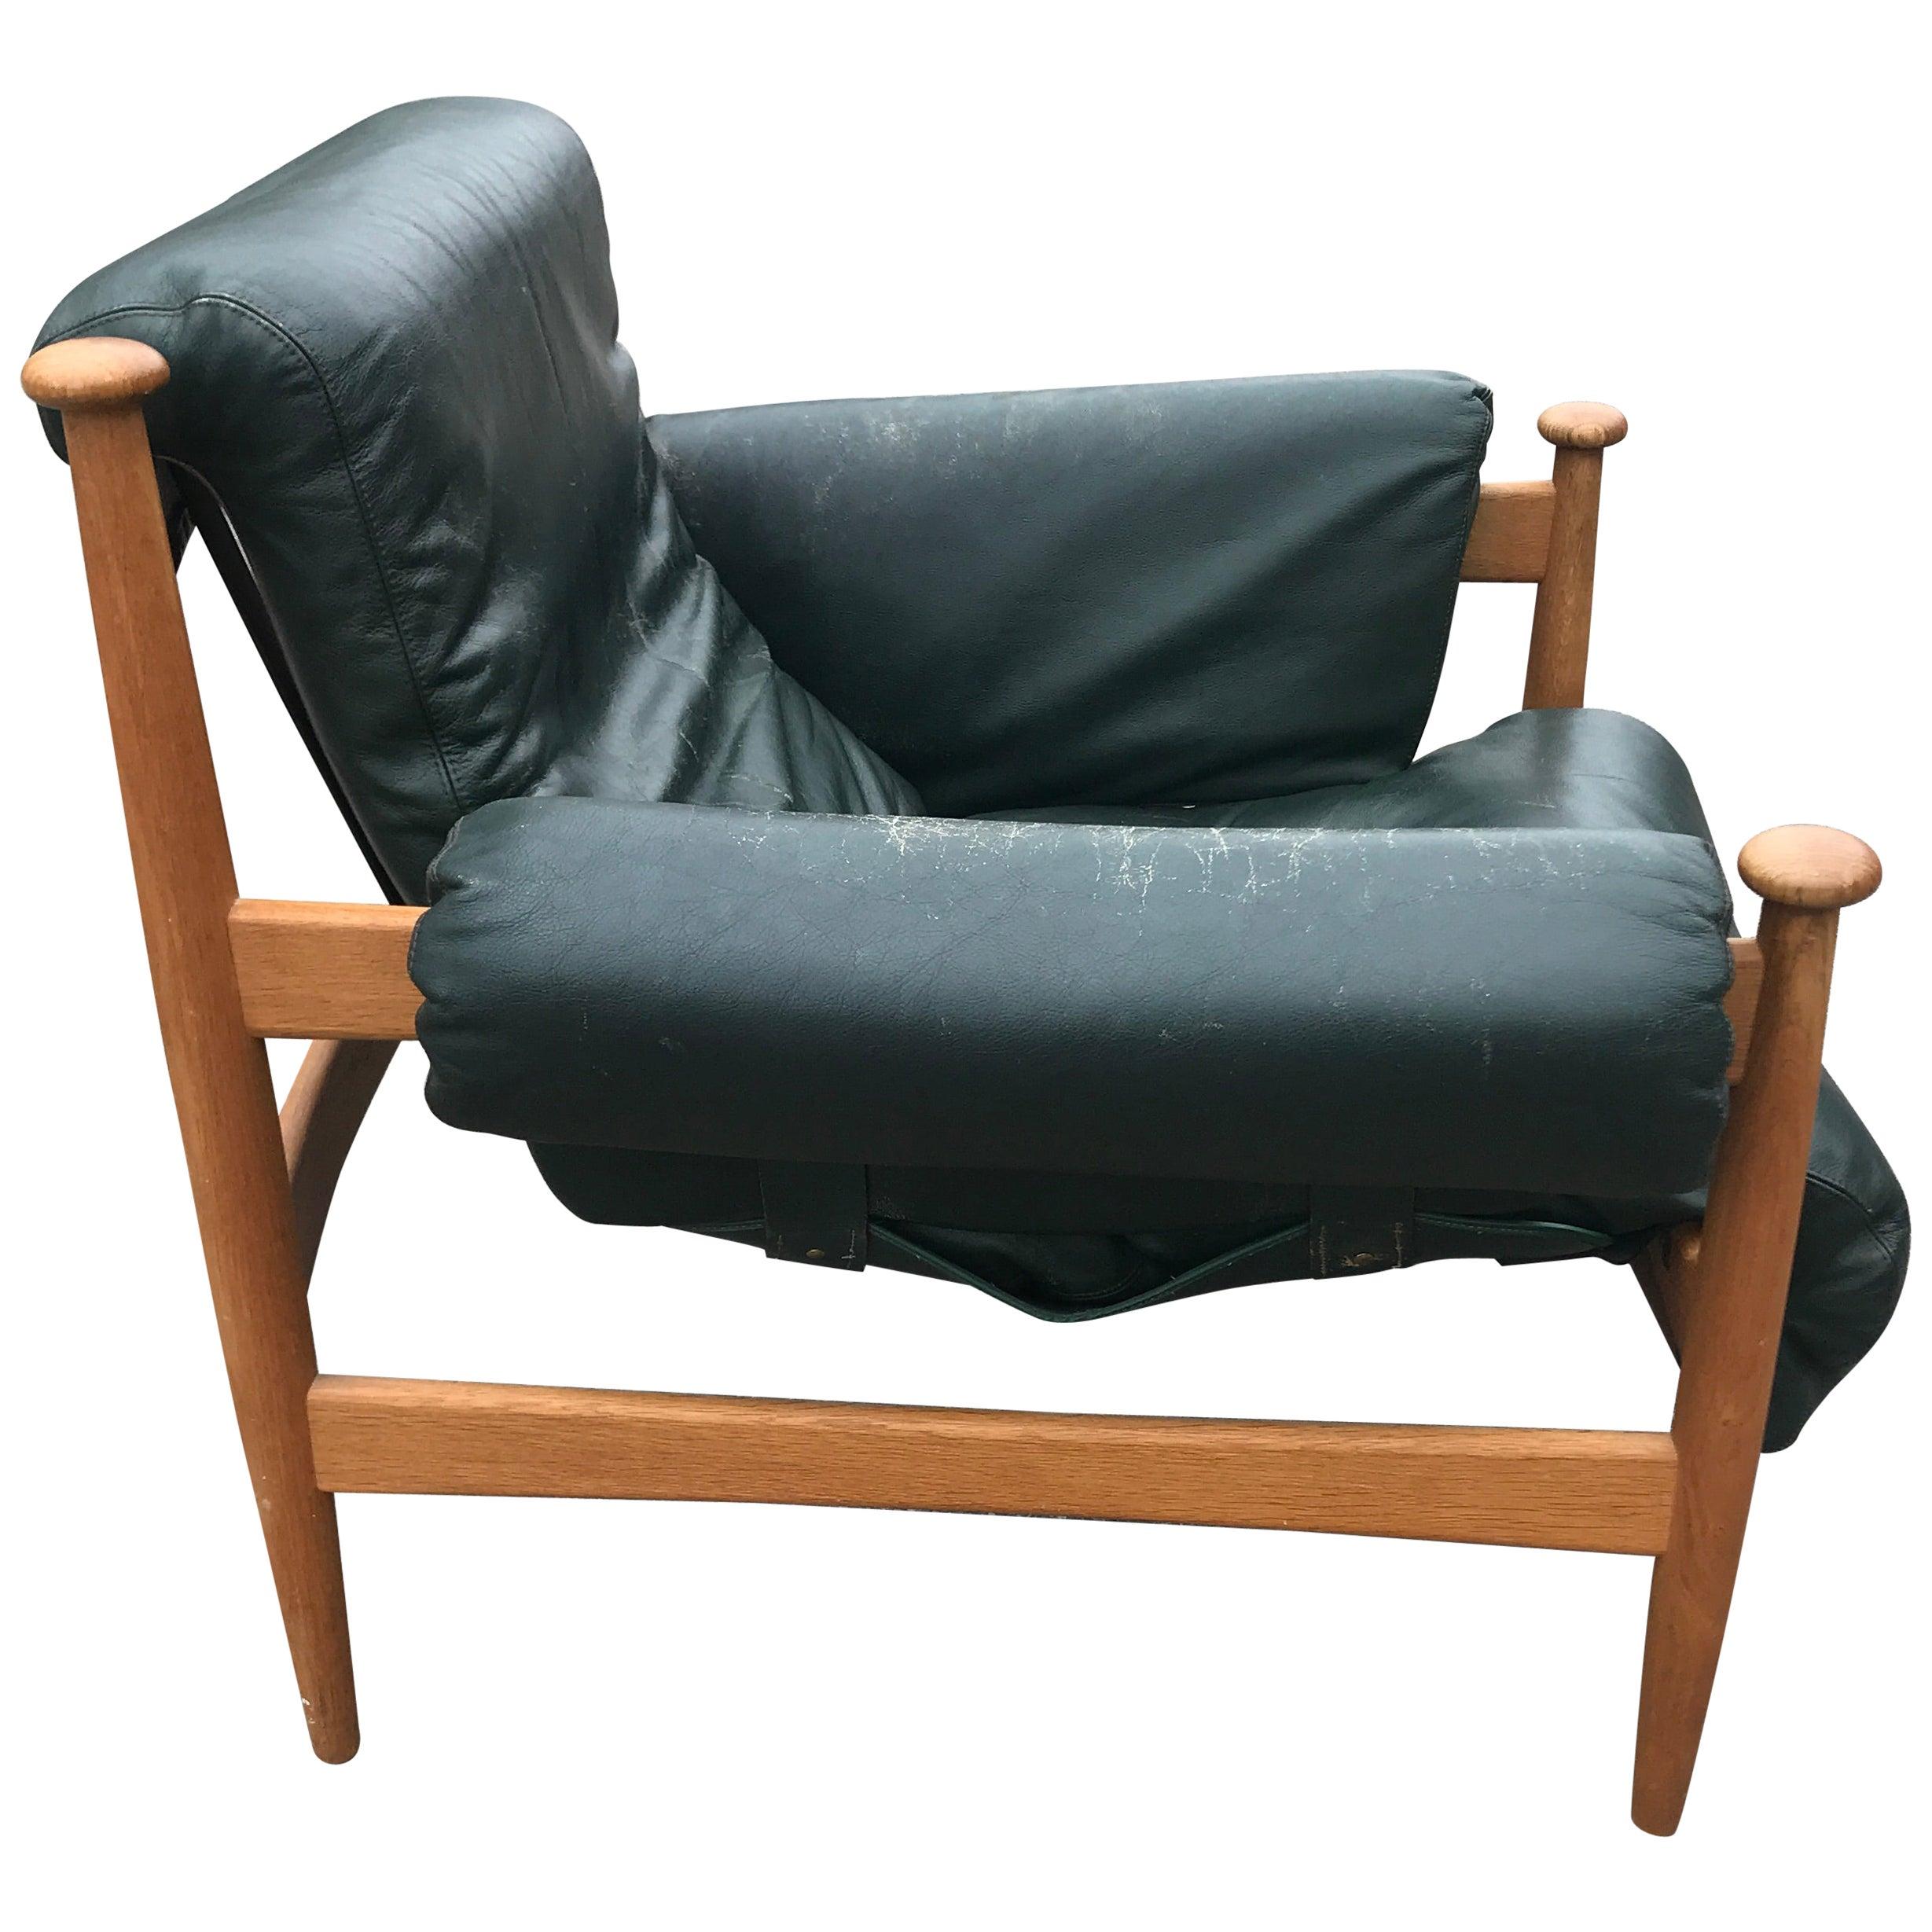 IRE Möbler Eric Merthen `Admiral` Midcentury Green Leather Lounge Chair, 1960s